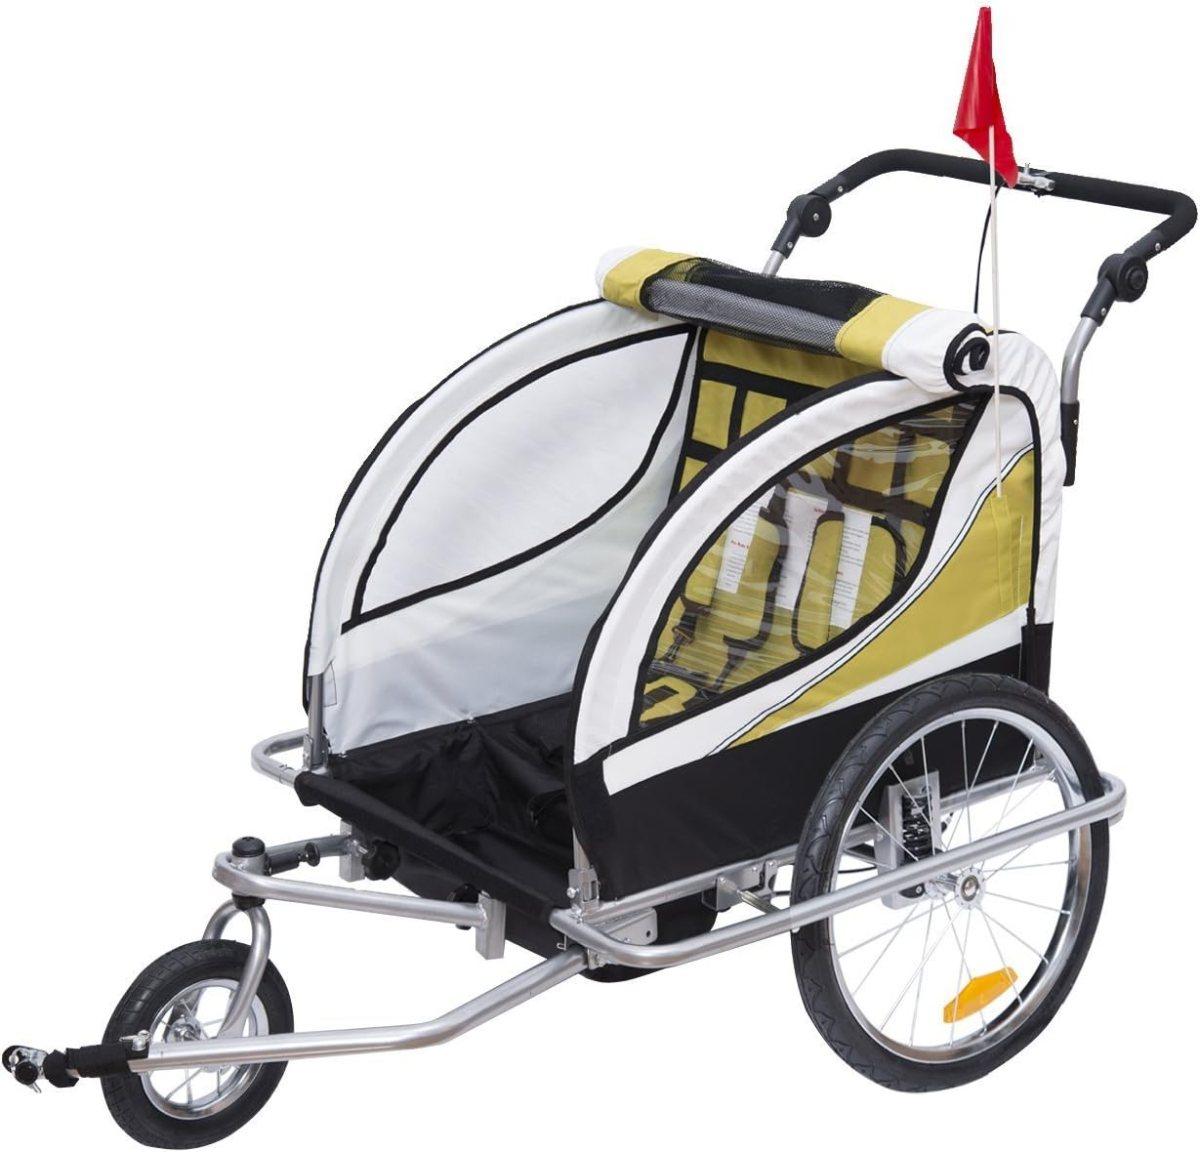 HOMCOM Remolque para Bicicleta tipo Carro con Barra de Paseo para Niños de 2 Plazas con Rueda Delantera Giratoria 360° y Asiento Acolchado Carga Máx. 40kg